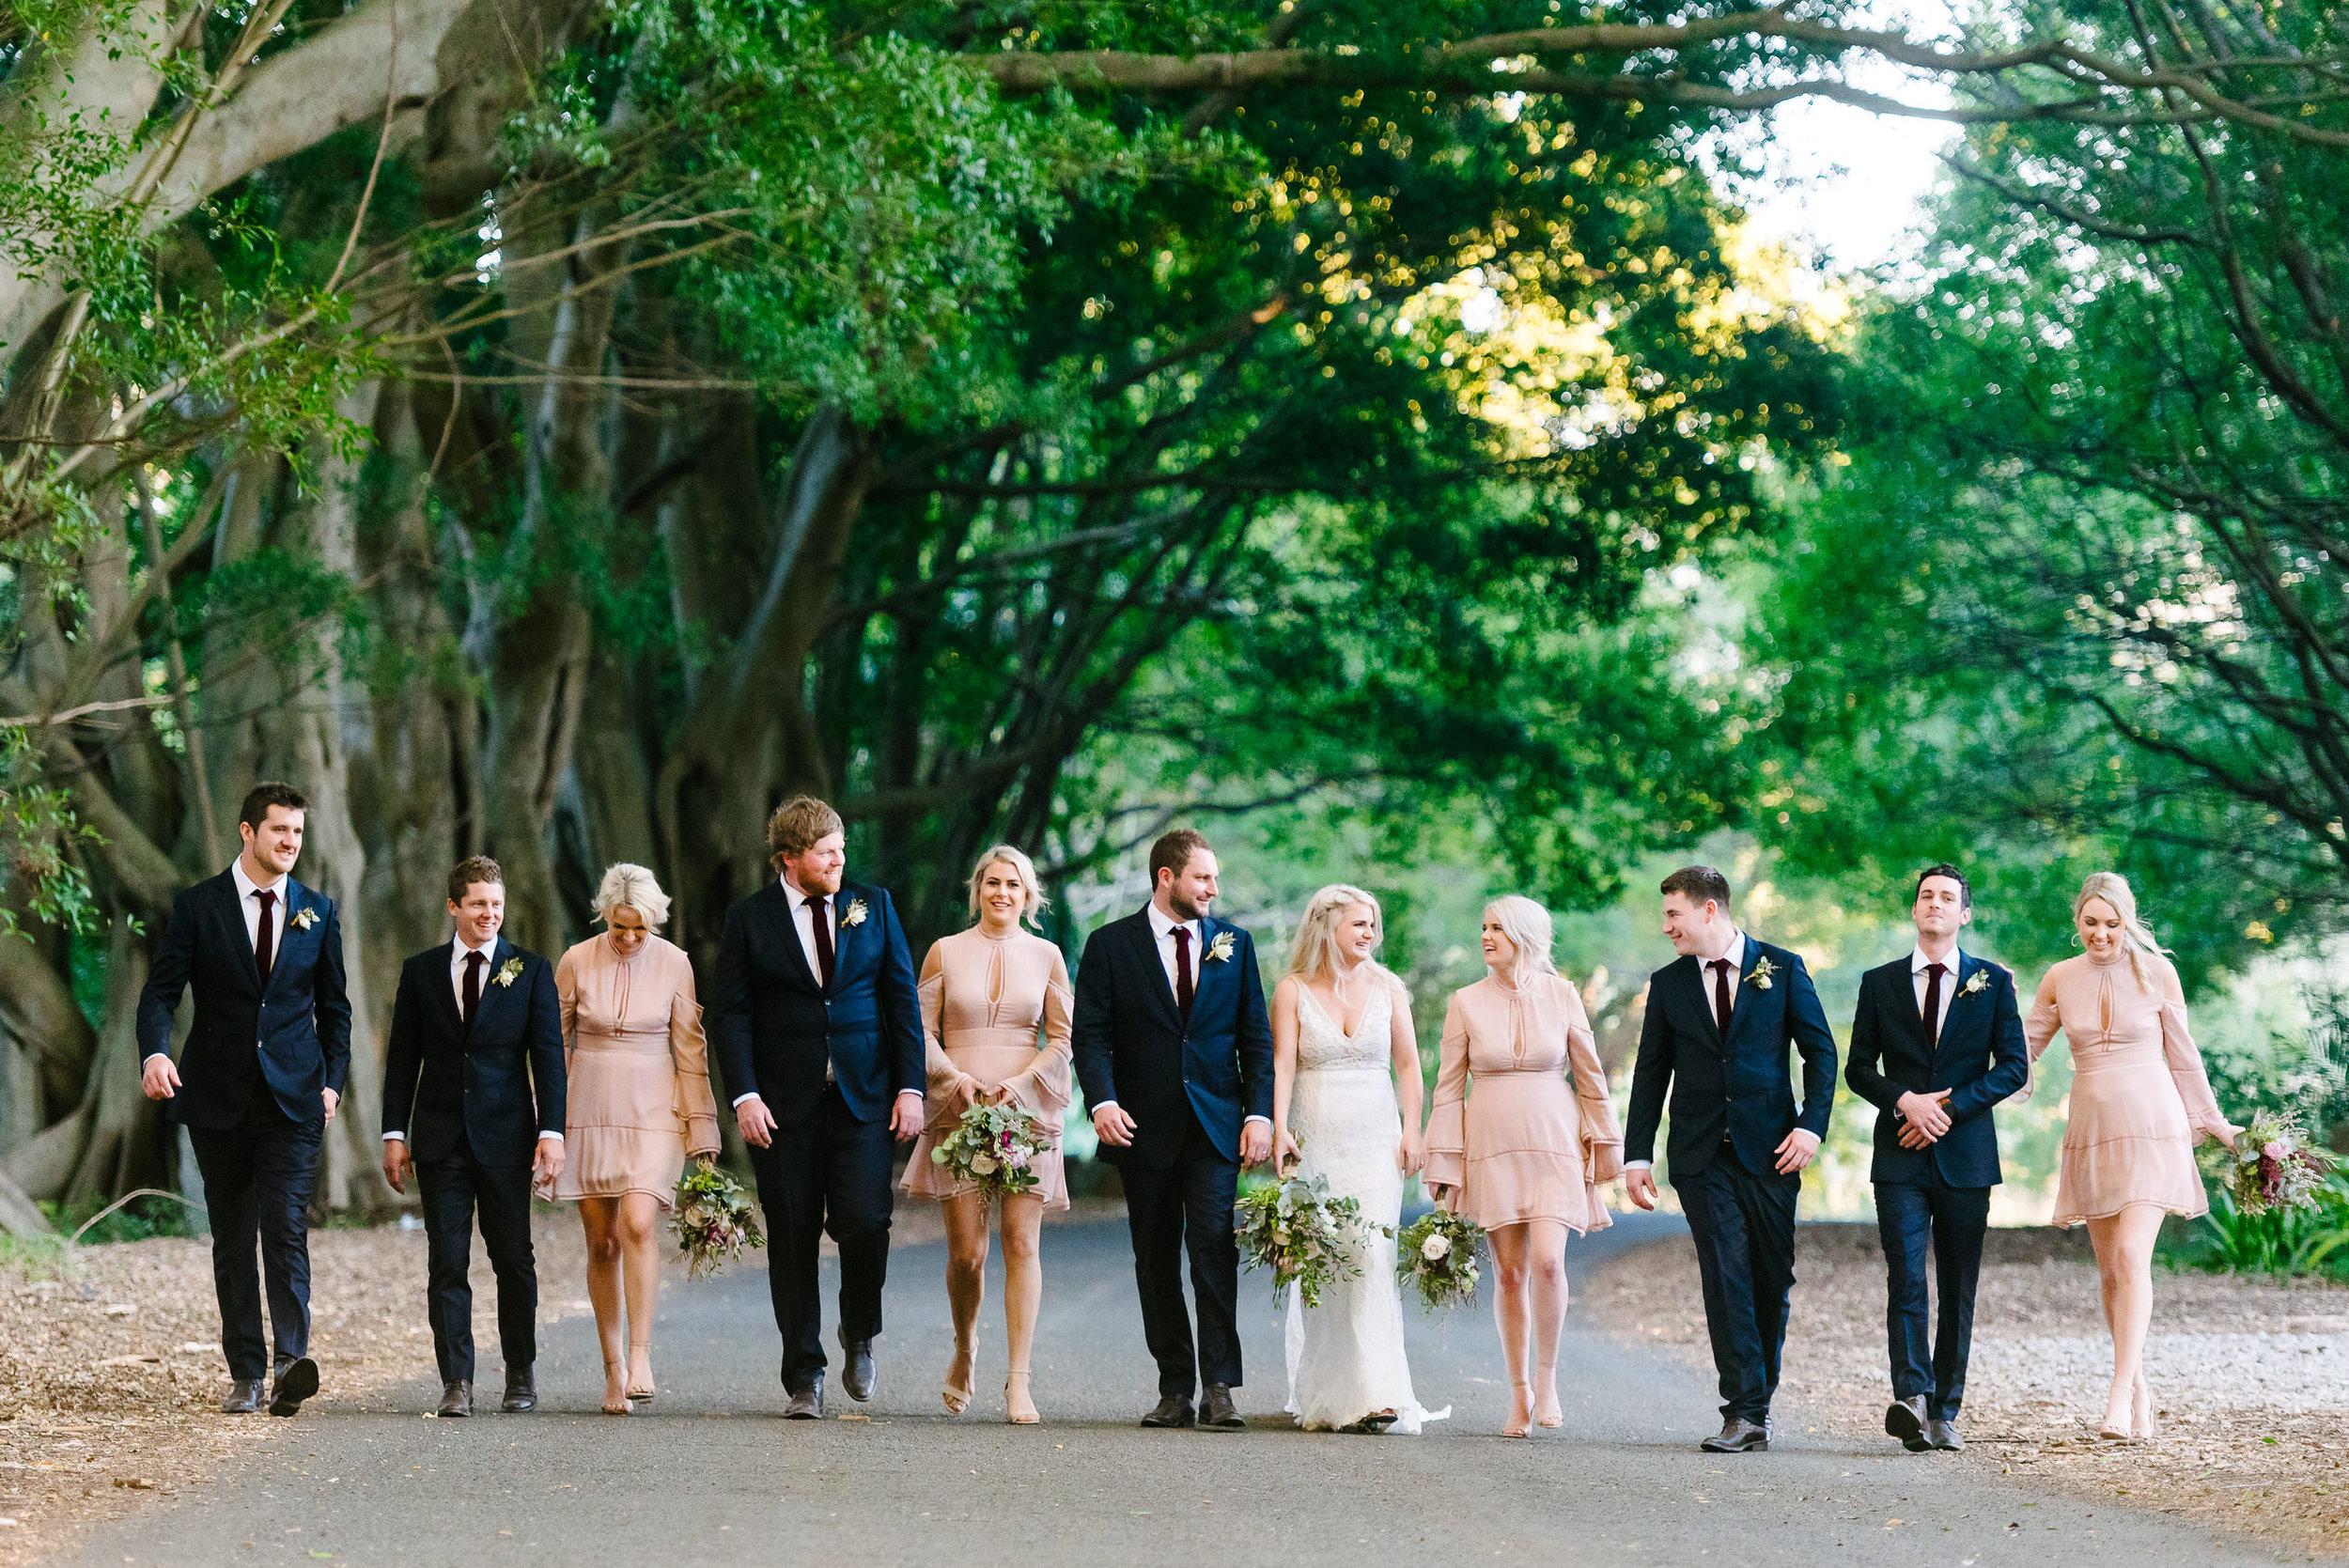 Justin_And_Jim_Photography_Byron_Bay_Wedding076.JPG